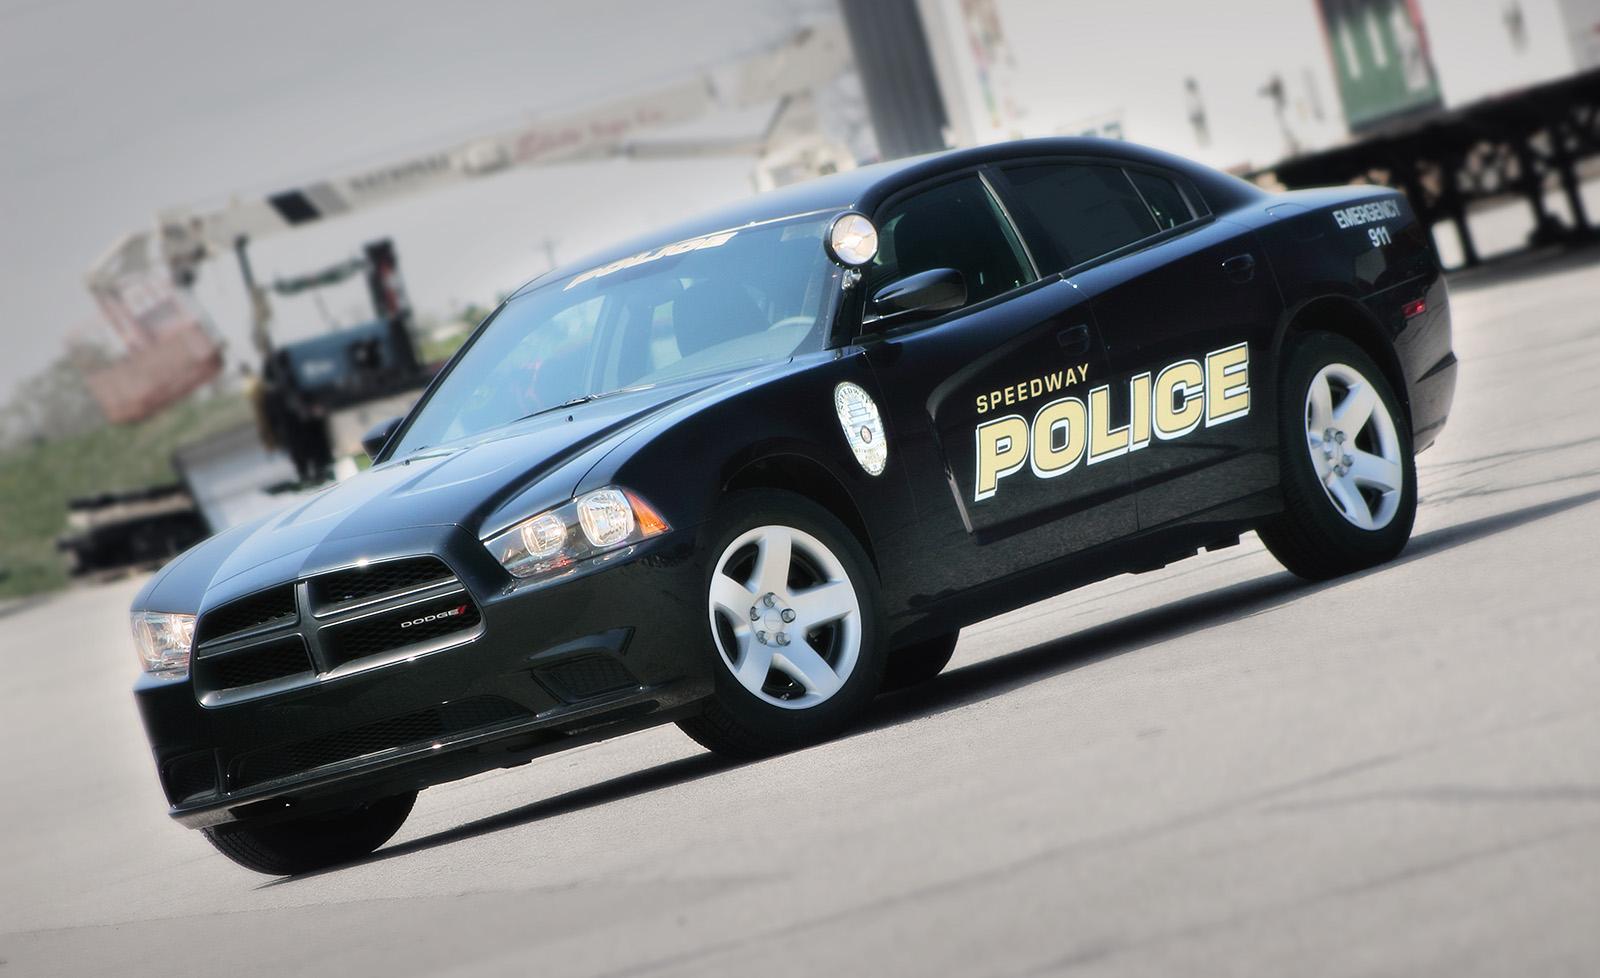 Speedway Police Vehicle Decal Set